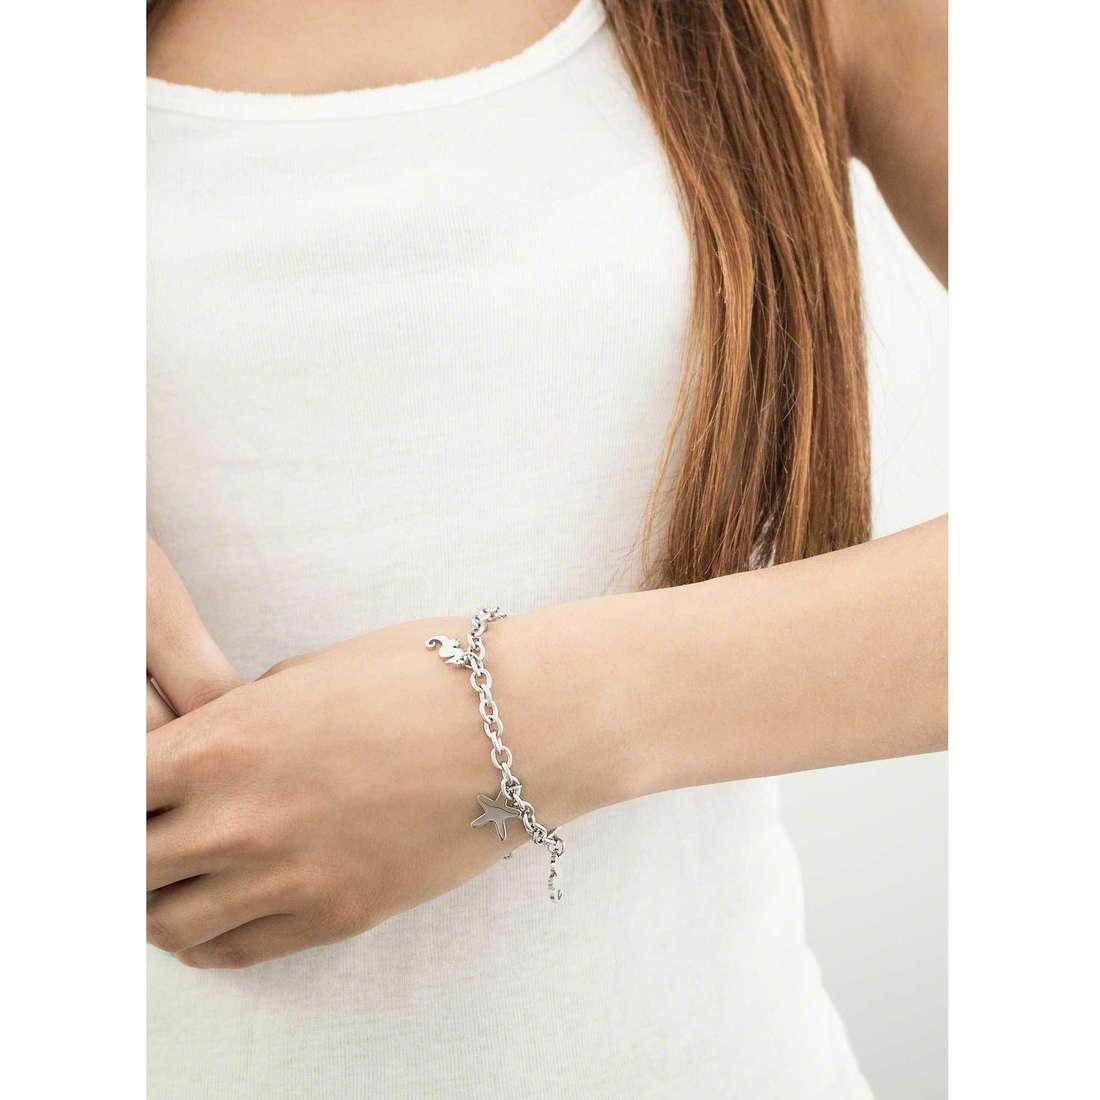 Sector bracciali Nature & Love donna SAGI12 indosso